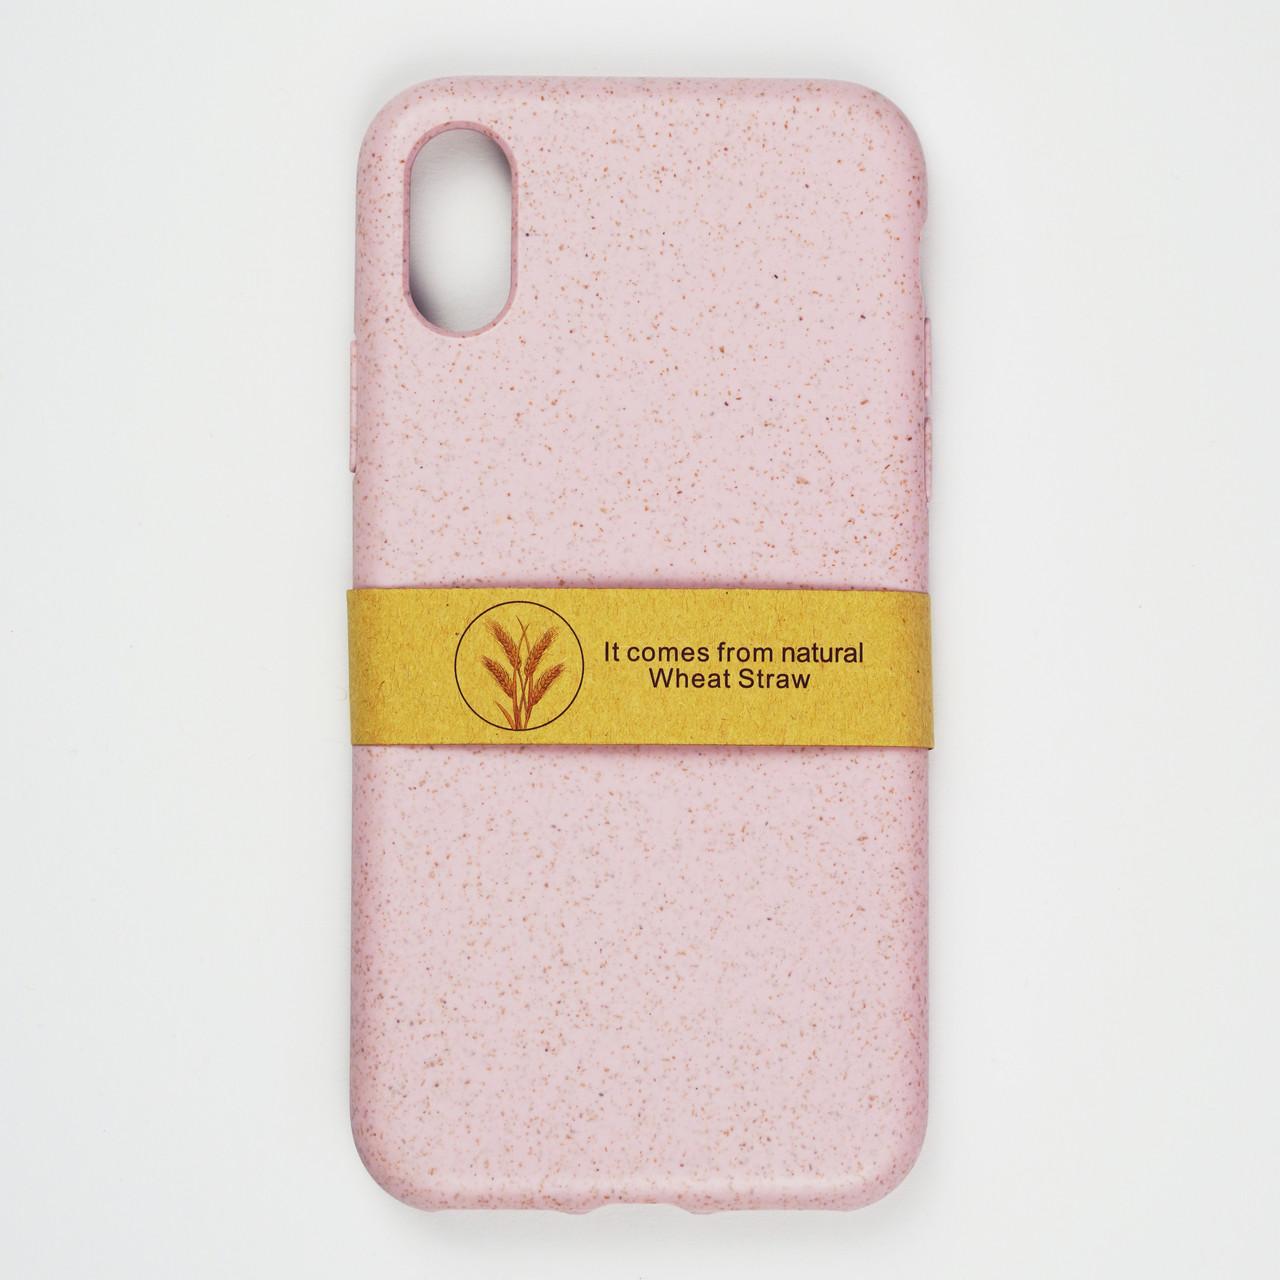 Биоразлагаемый чехол ECO Wheat Straw для iPhone XR Pink